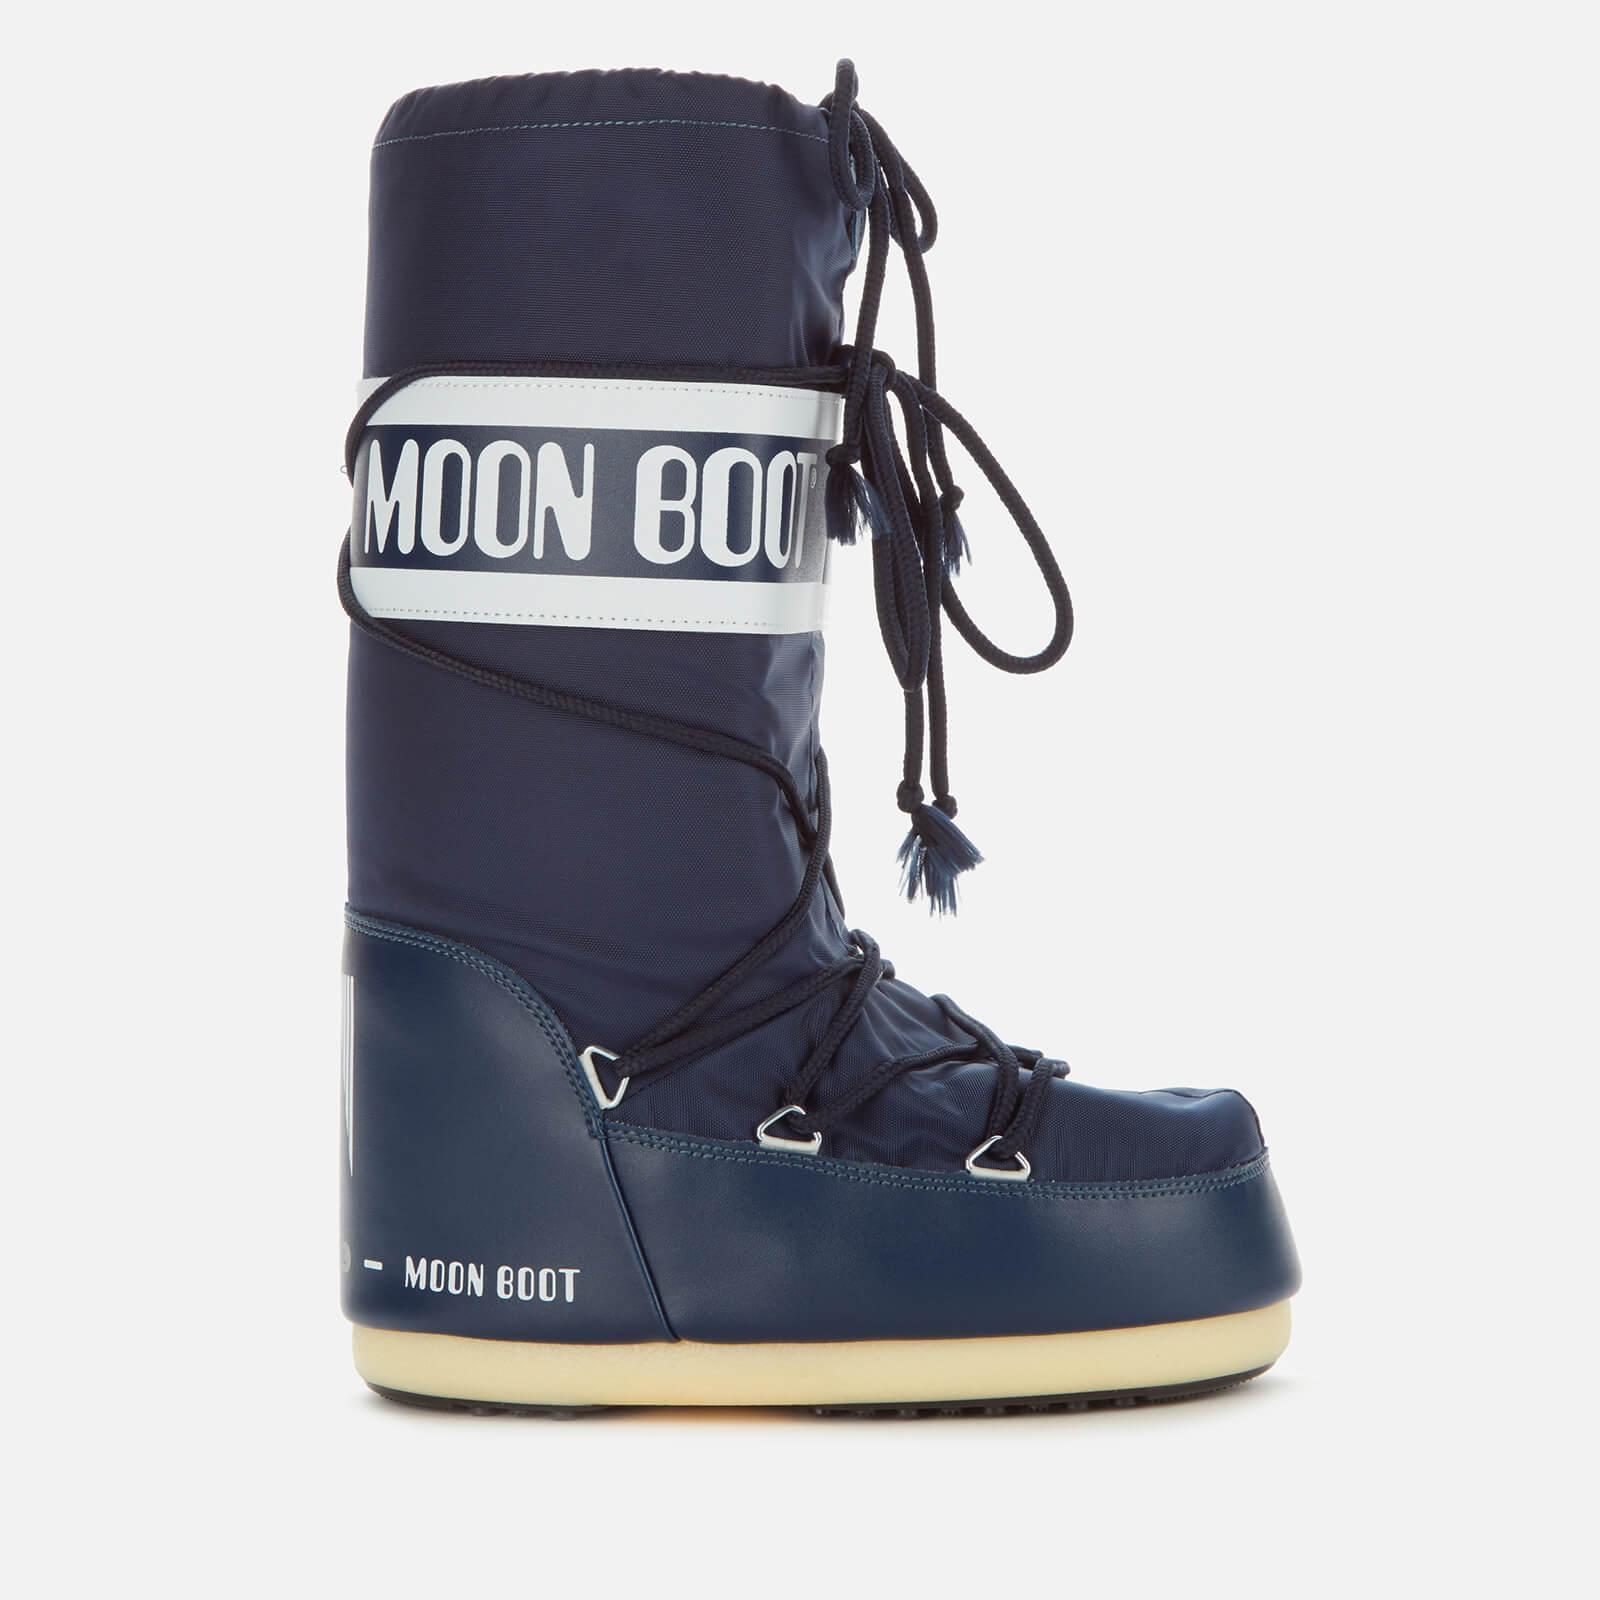 Moon Boot Women's Nylon Boots - Blue - EU 39-41 - Blue